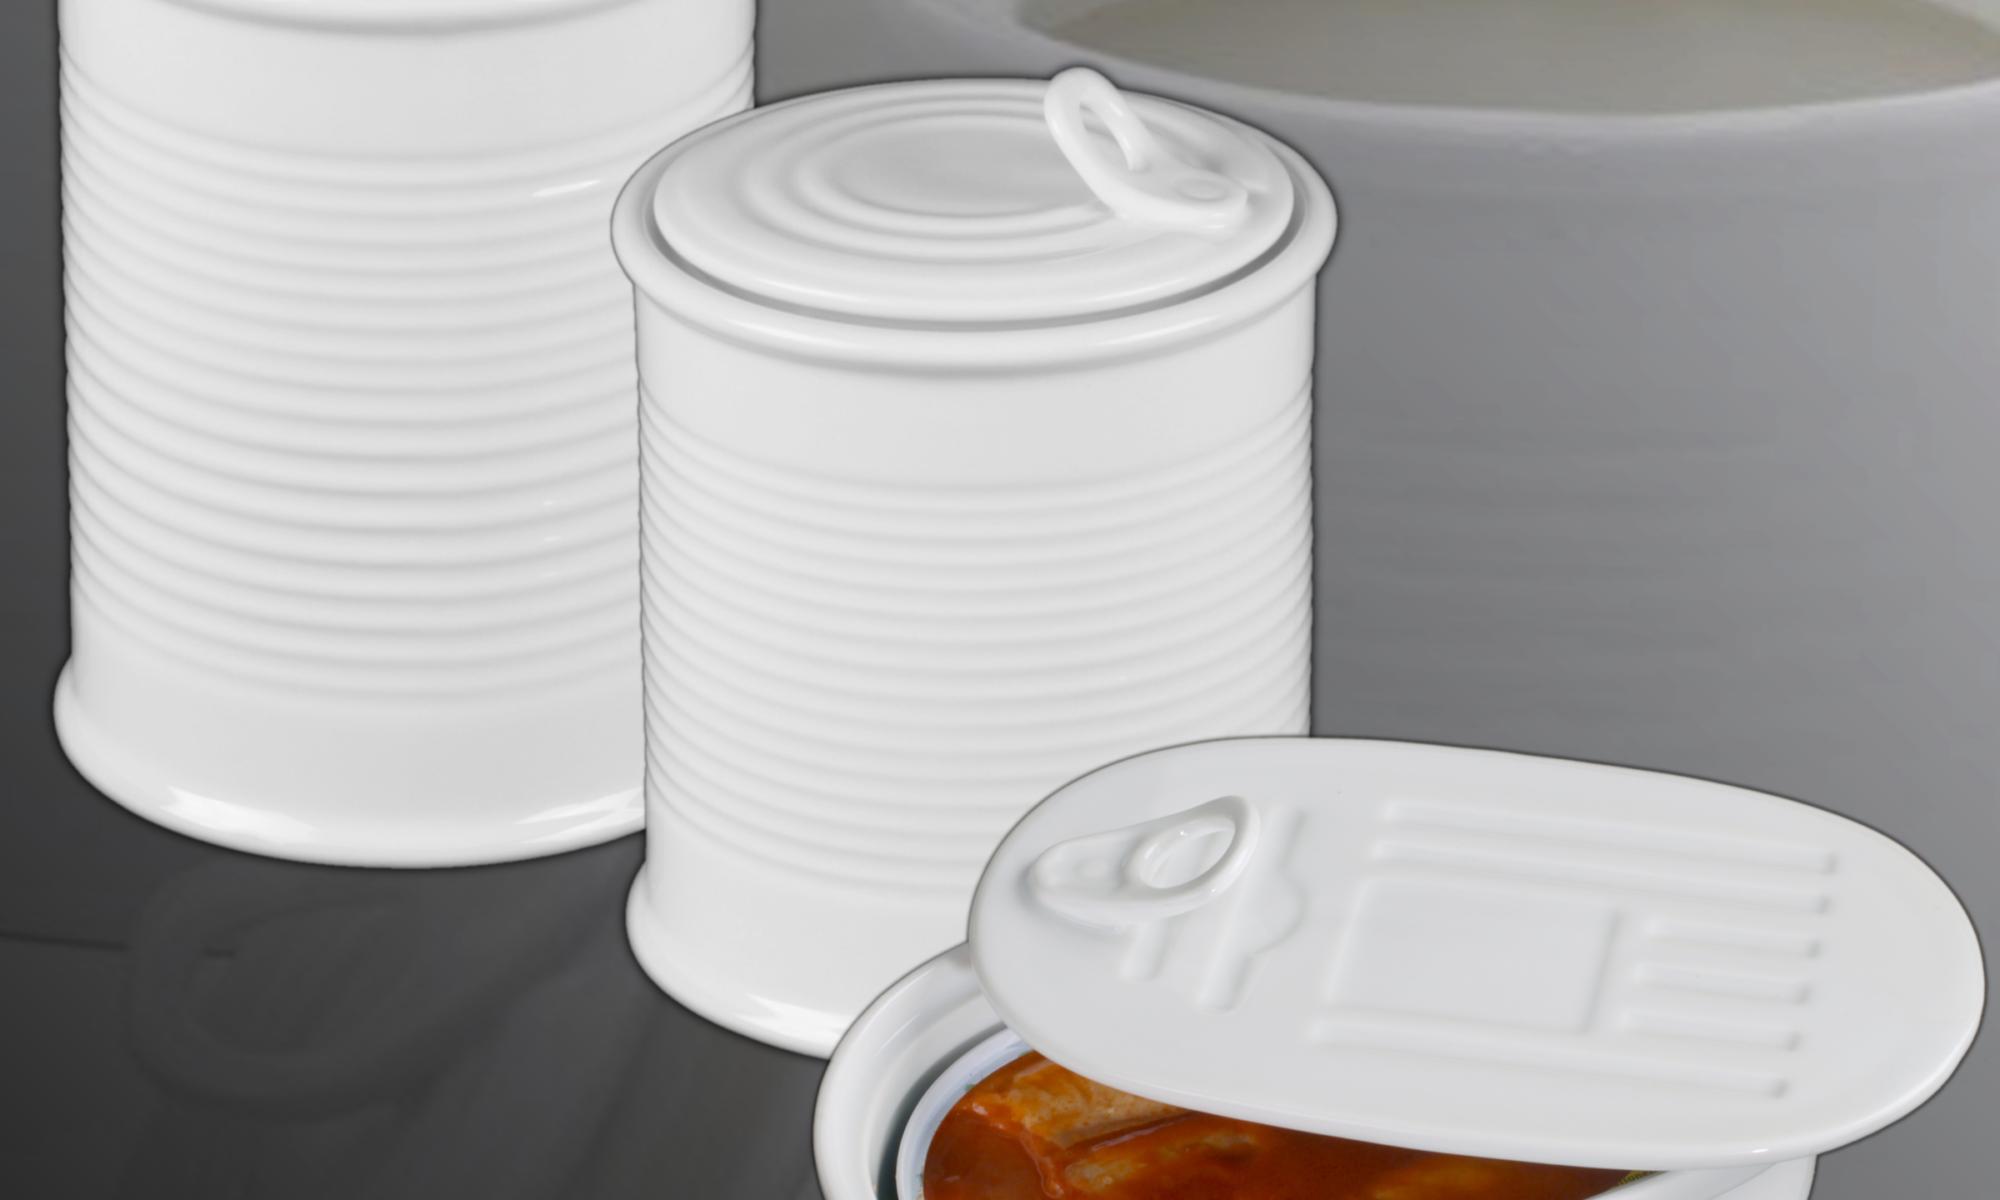 Konservendosen aus Porzellan